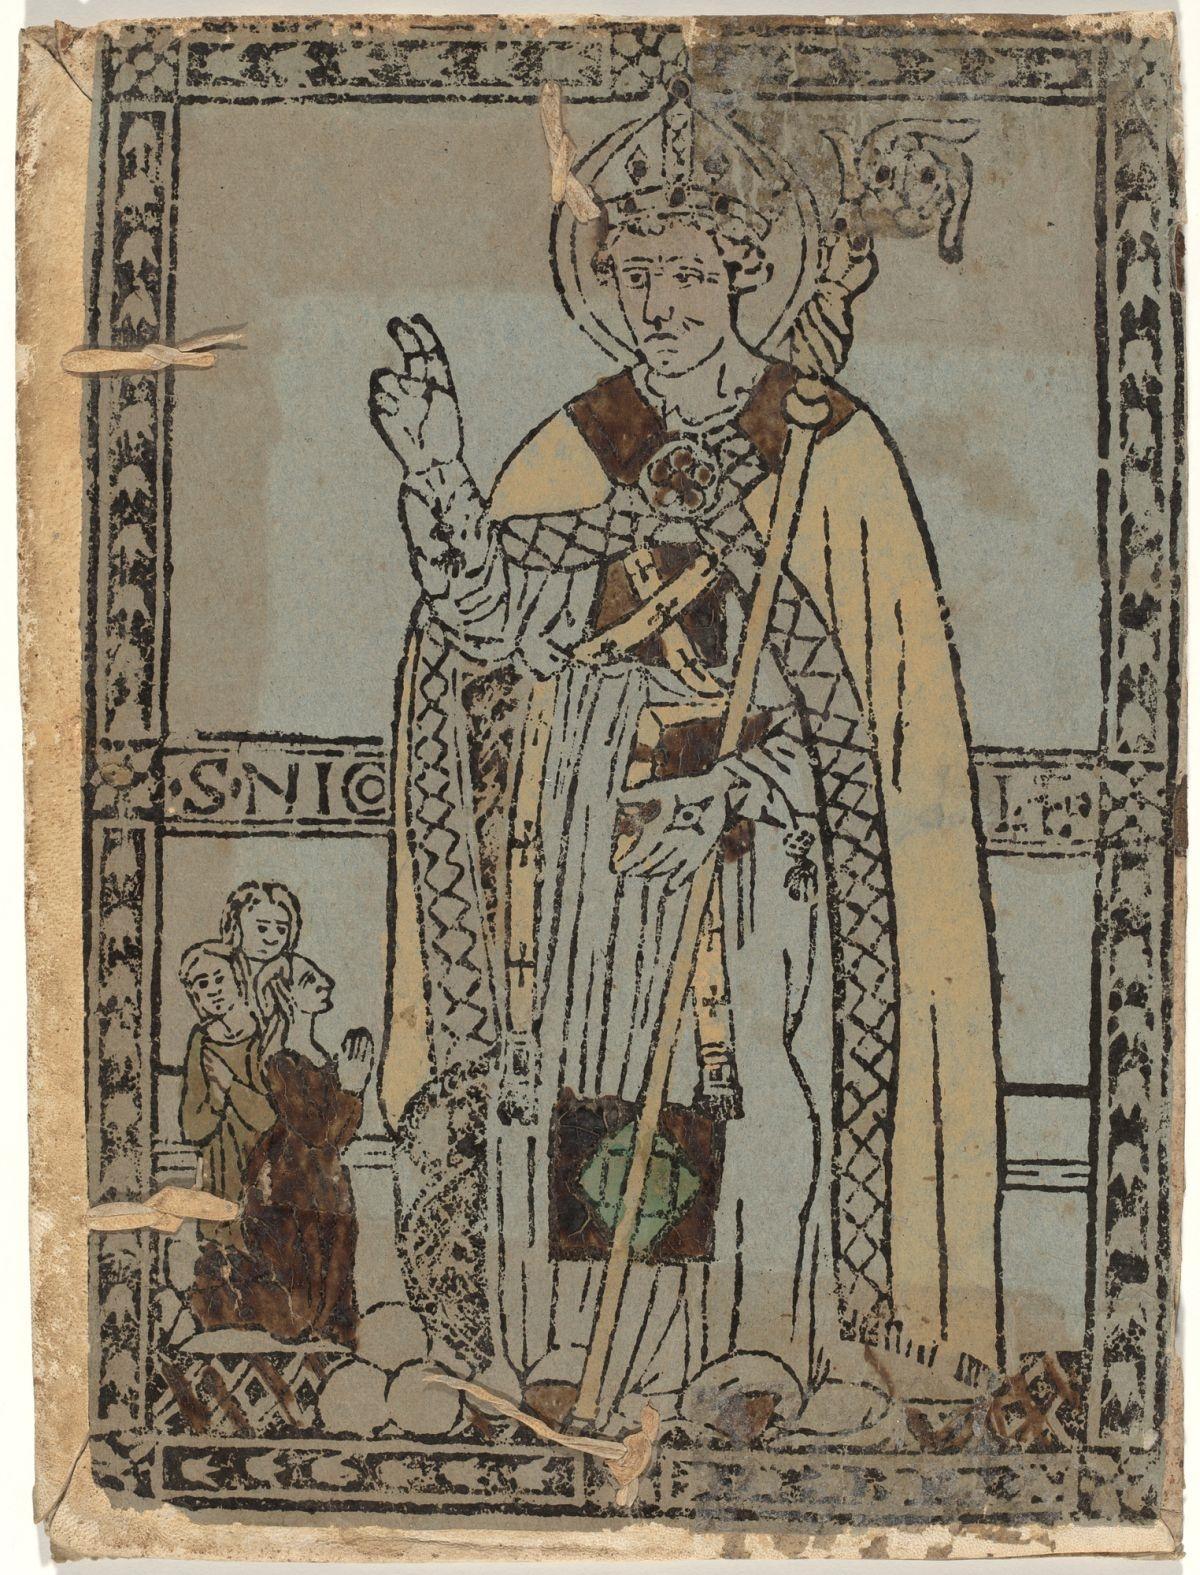 San Nicola di Myra detto San Nicola di Bari